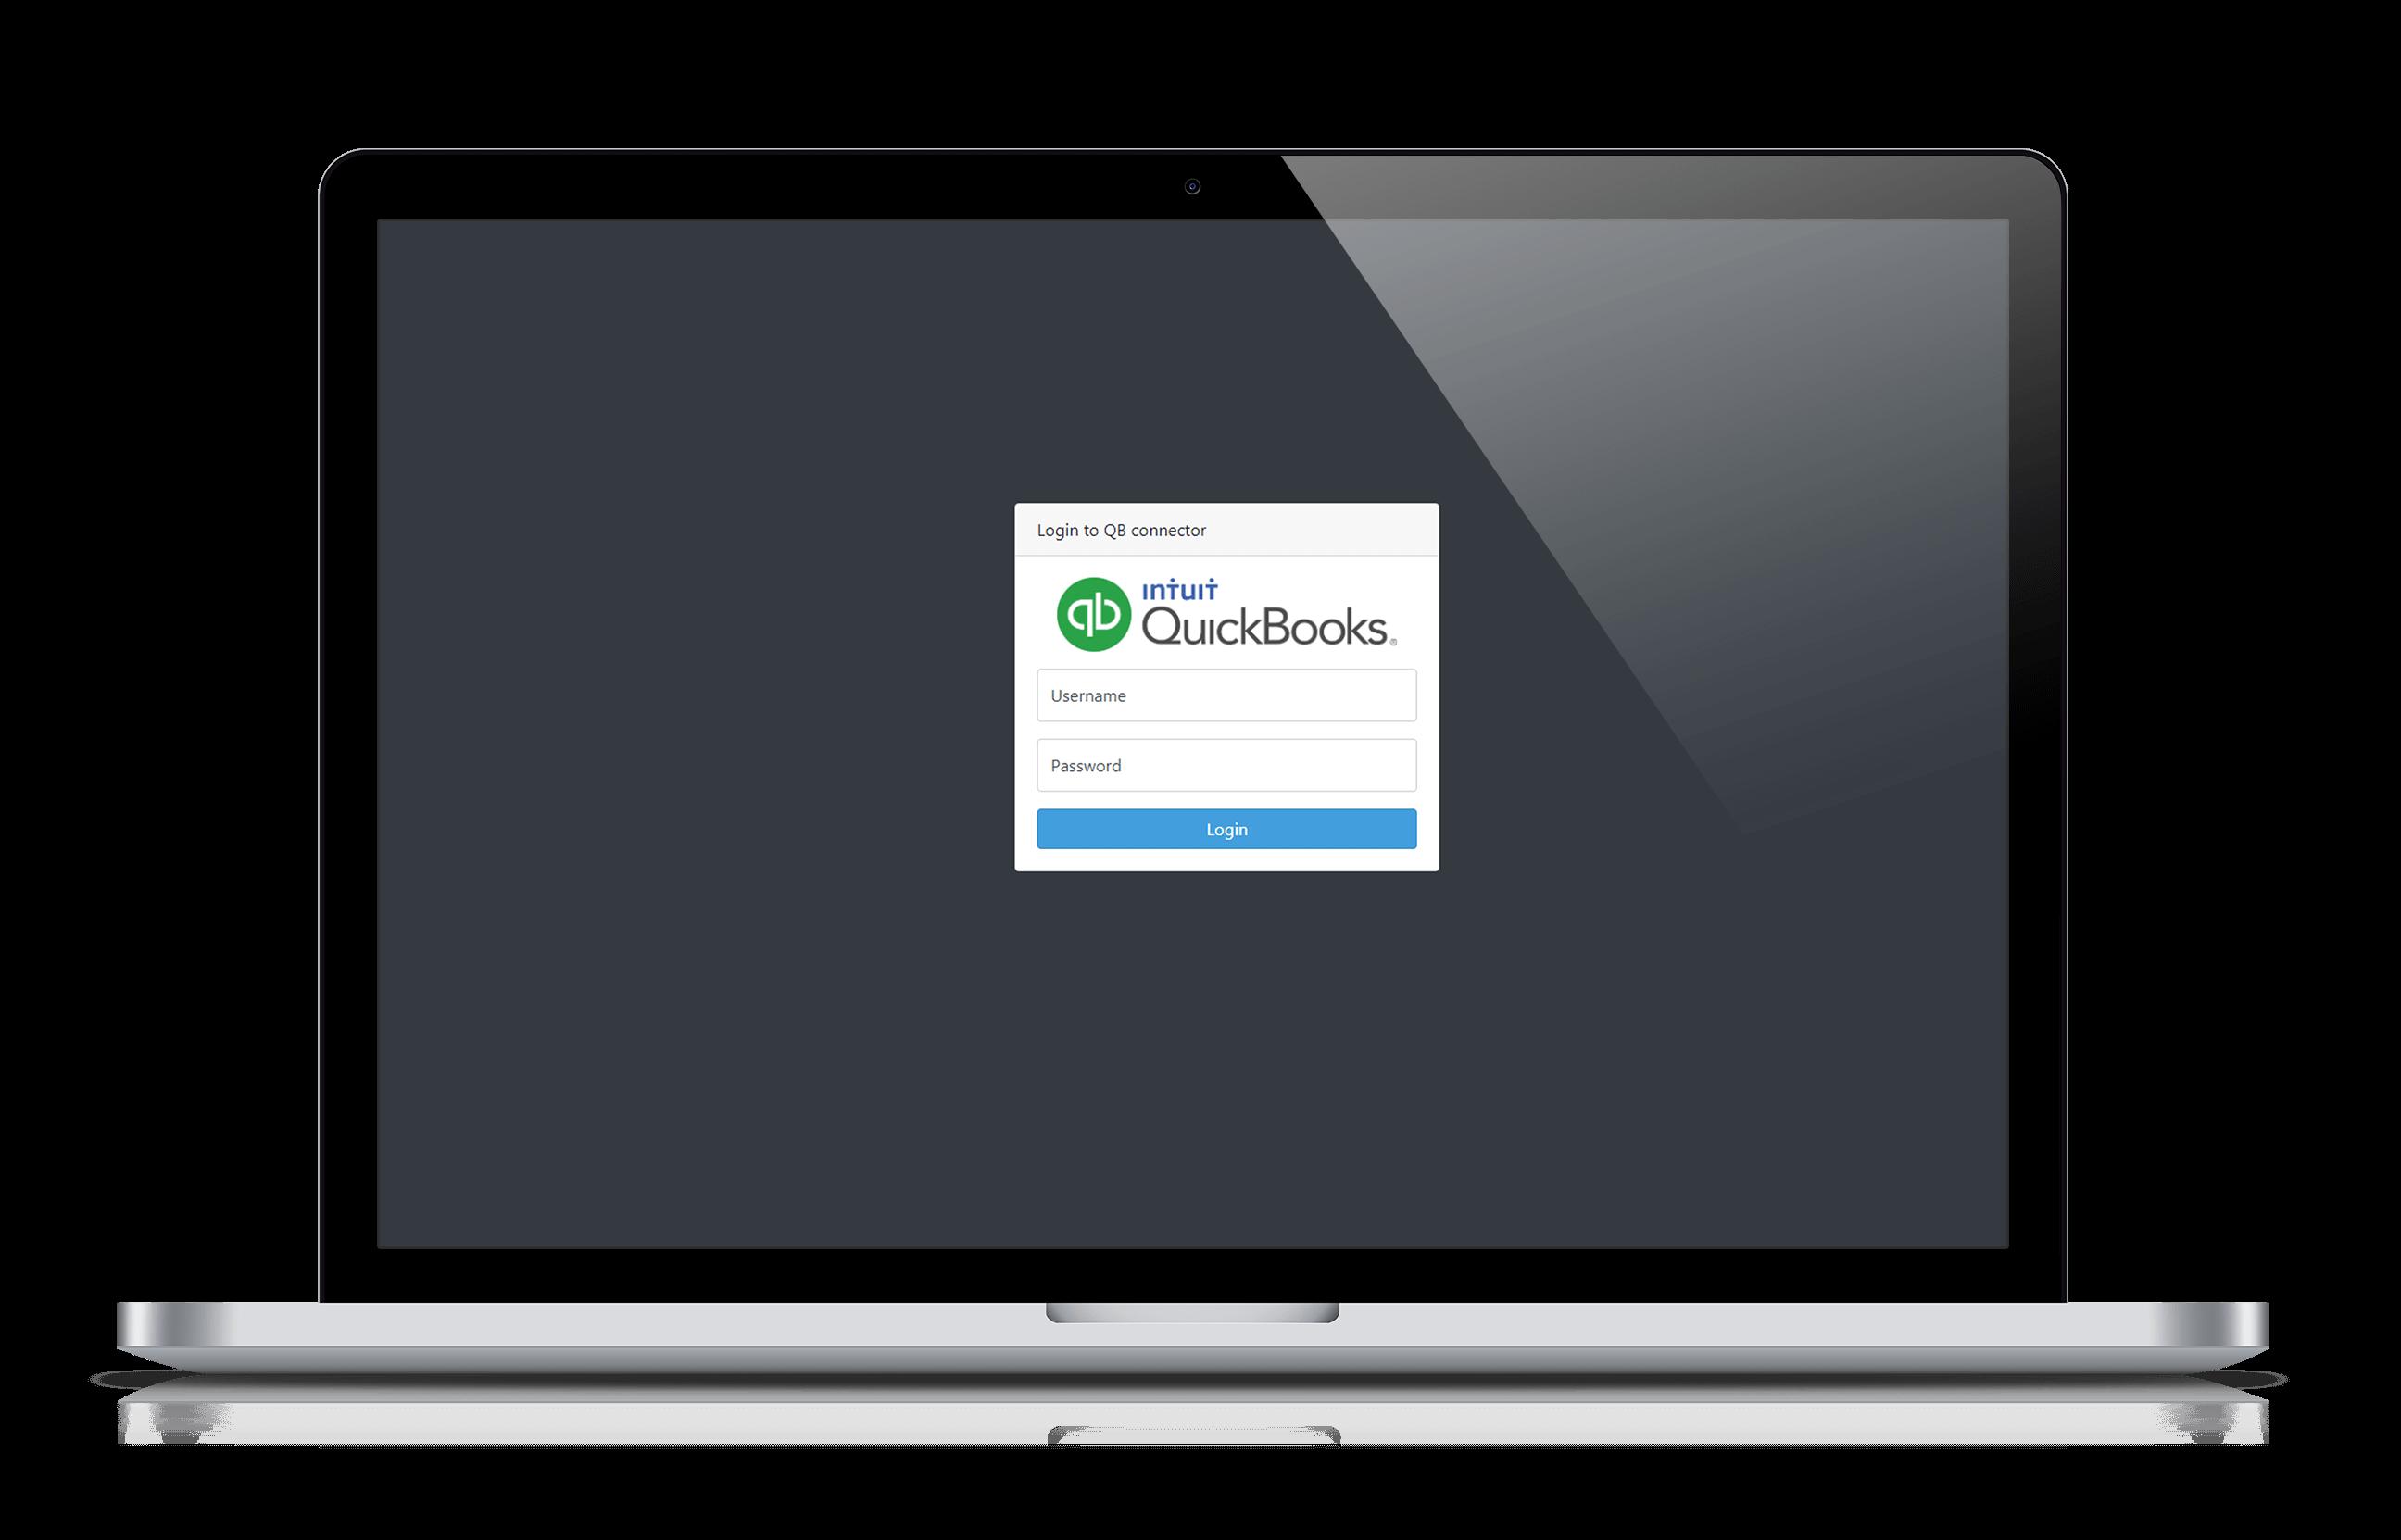 QB connector login page